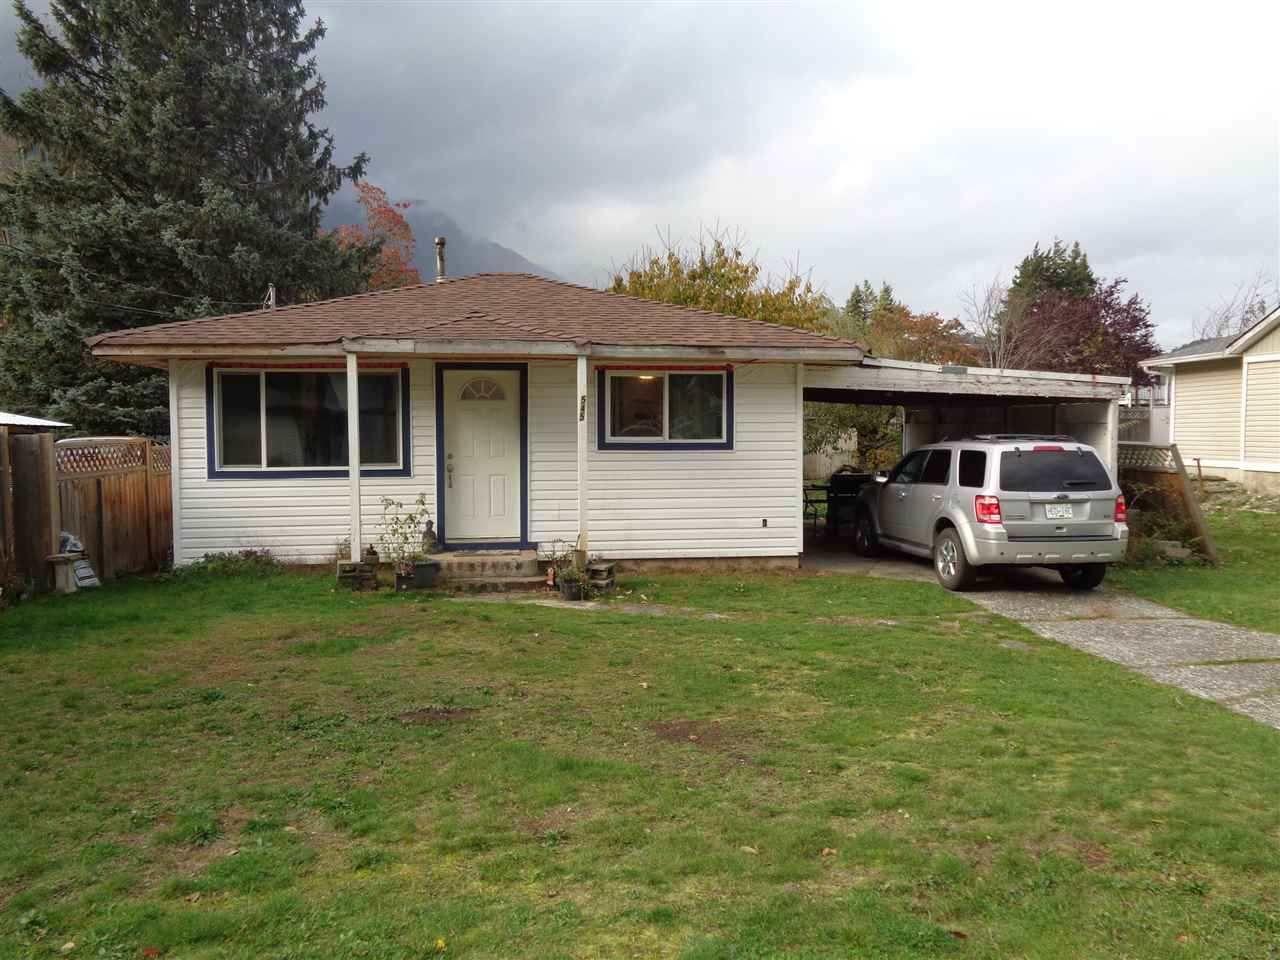 Main Photo: 545 DOUGLAS Street in Hope: Hope Center House for sale : MLS®# R2442473